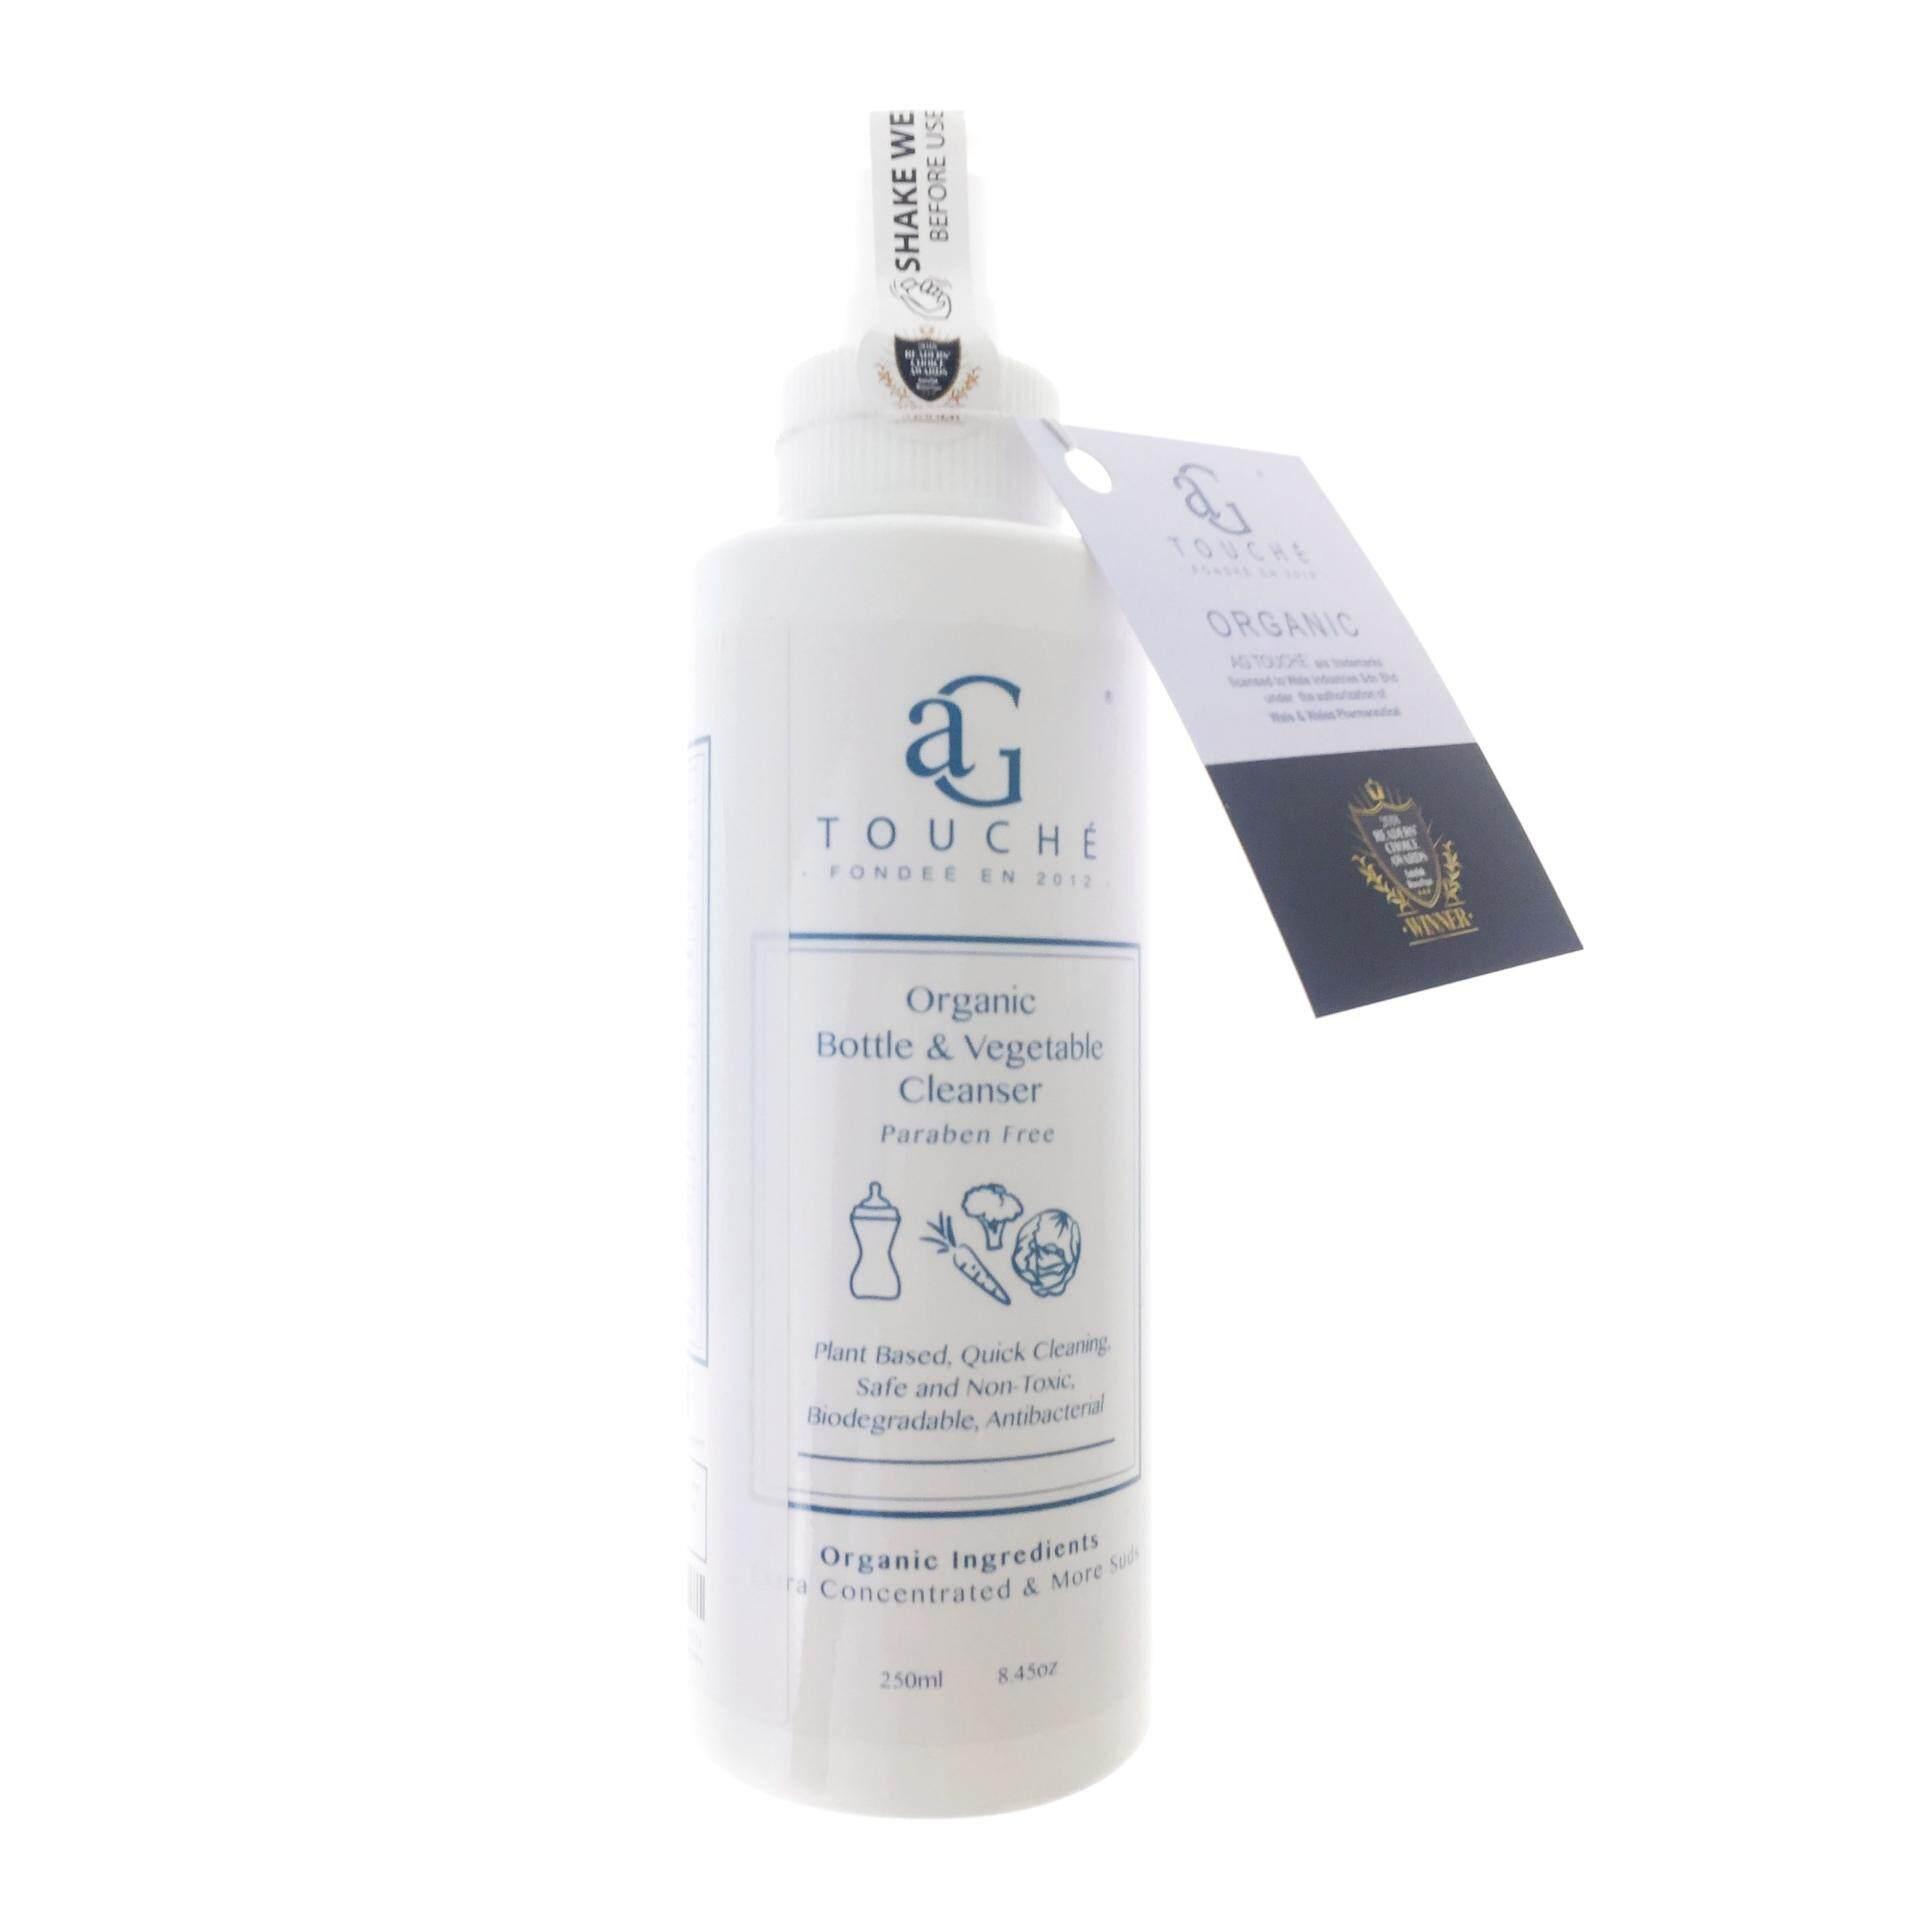 AG Touché Organic Bottle & Vegetable Cleanser 250ml & 1L